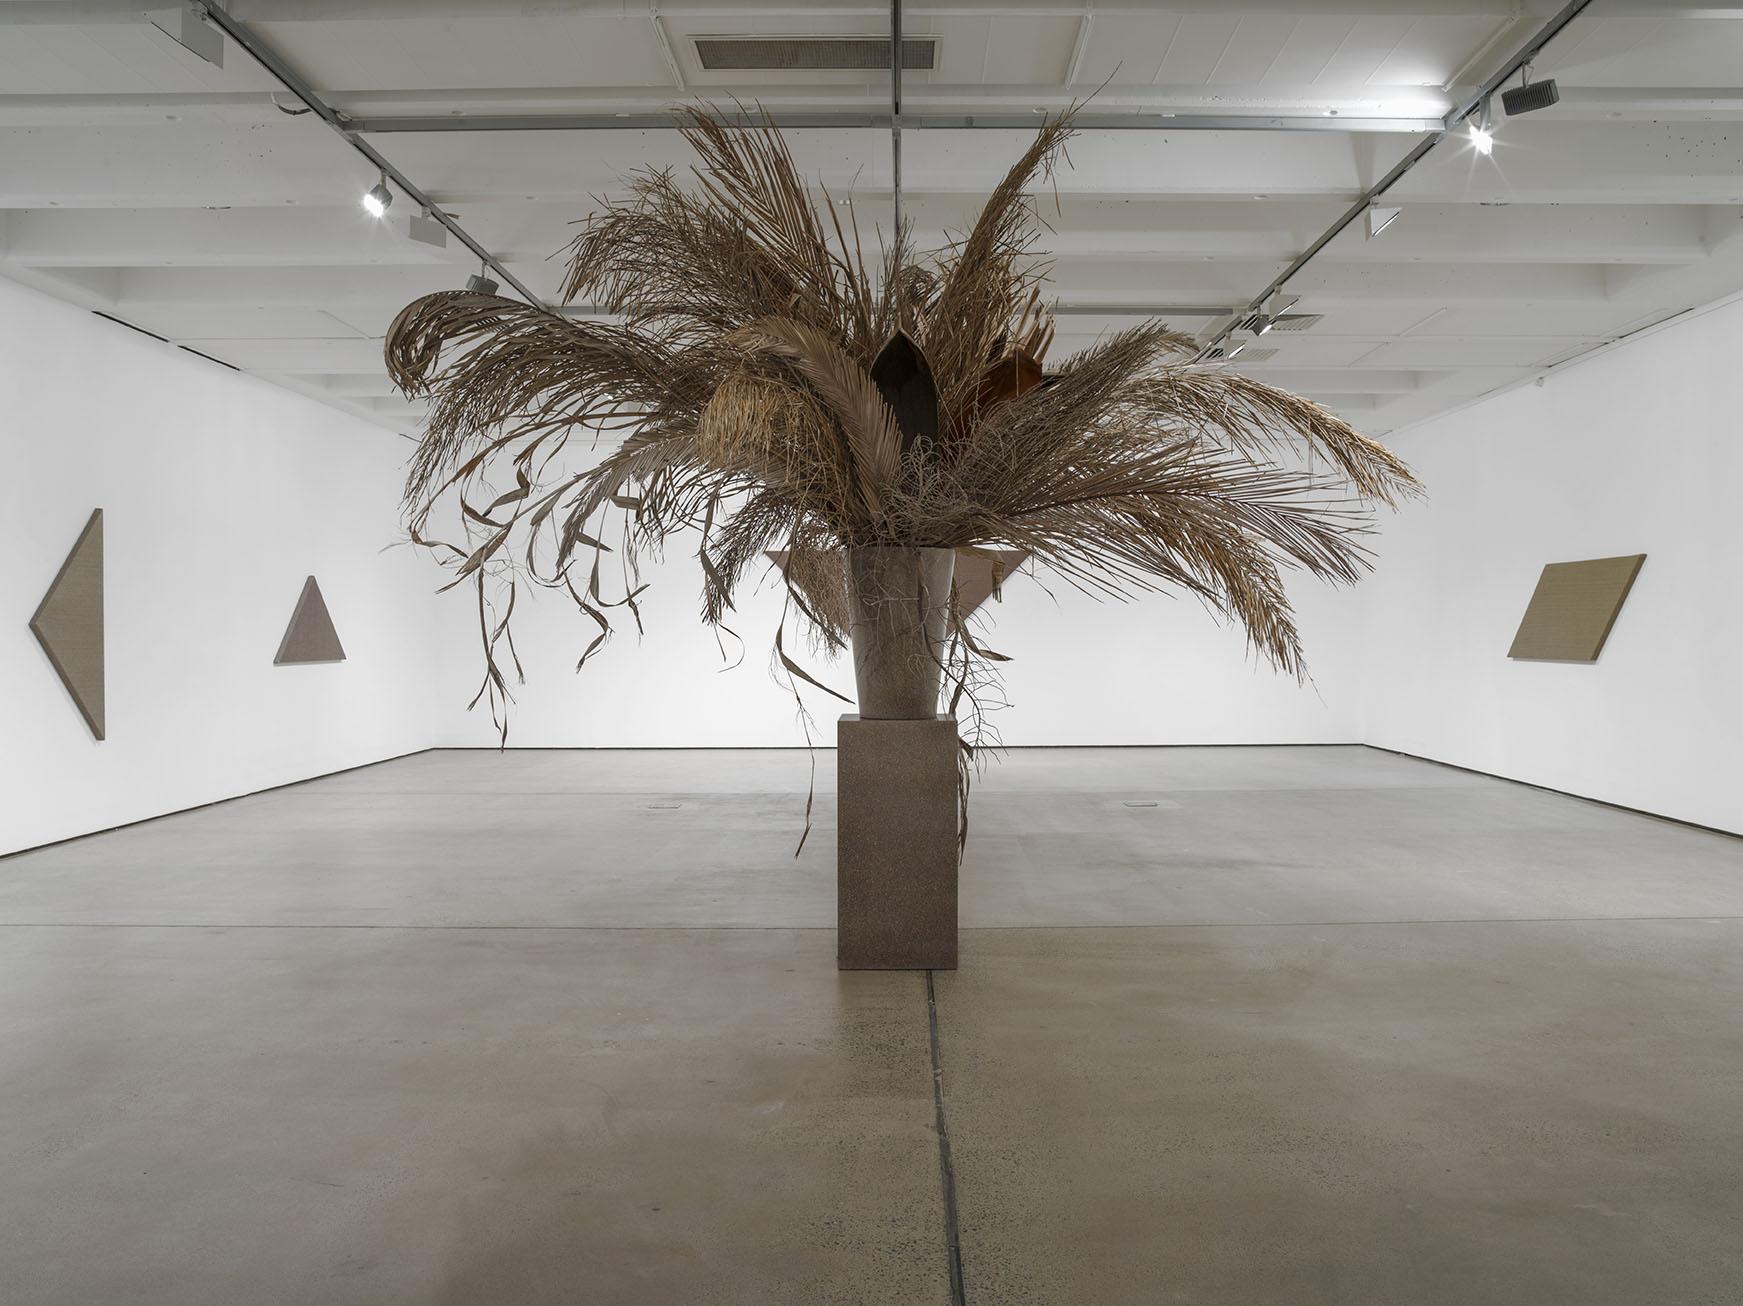 Installation view, 'Ebb Rains', Institute of Modern Art, 2017. Photography: Carl Warner. In view: Willem de Rooij, 'Bouquet XVI', 2015.